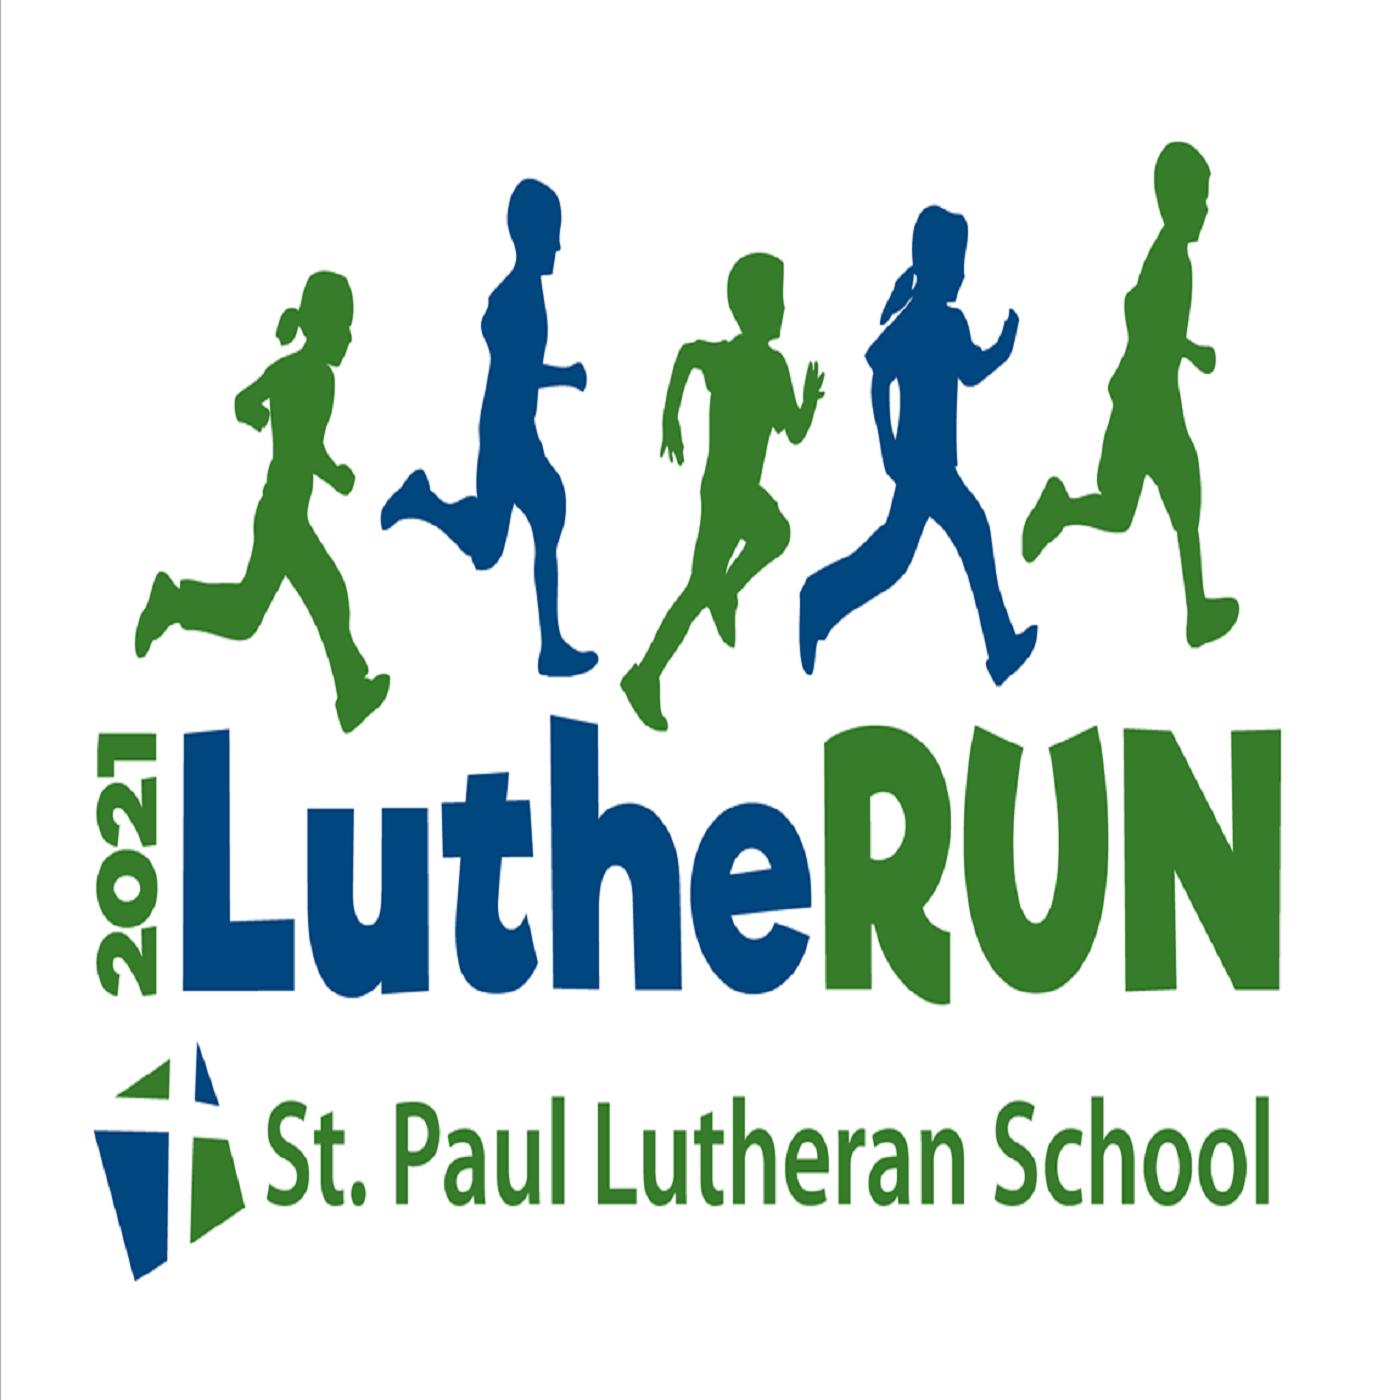 LutheRun